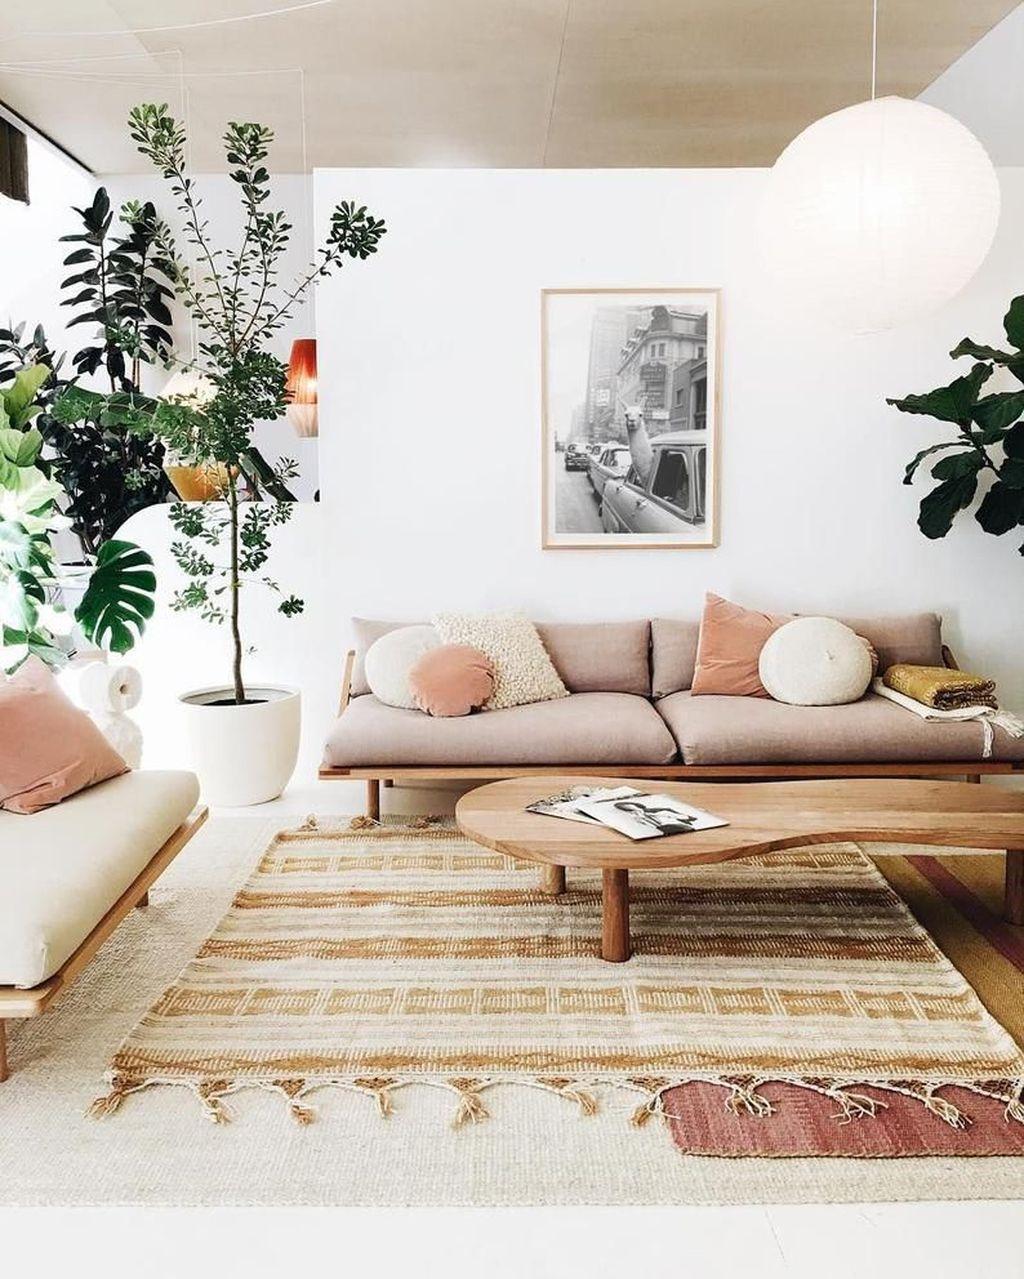 Enchanting Living Room Decor Ideas That Trending This Winter 08